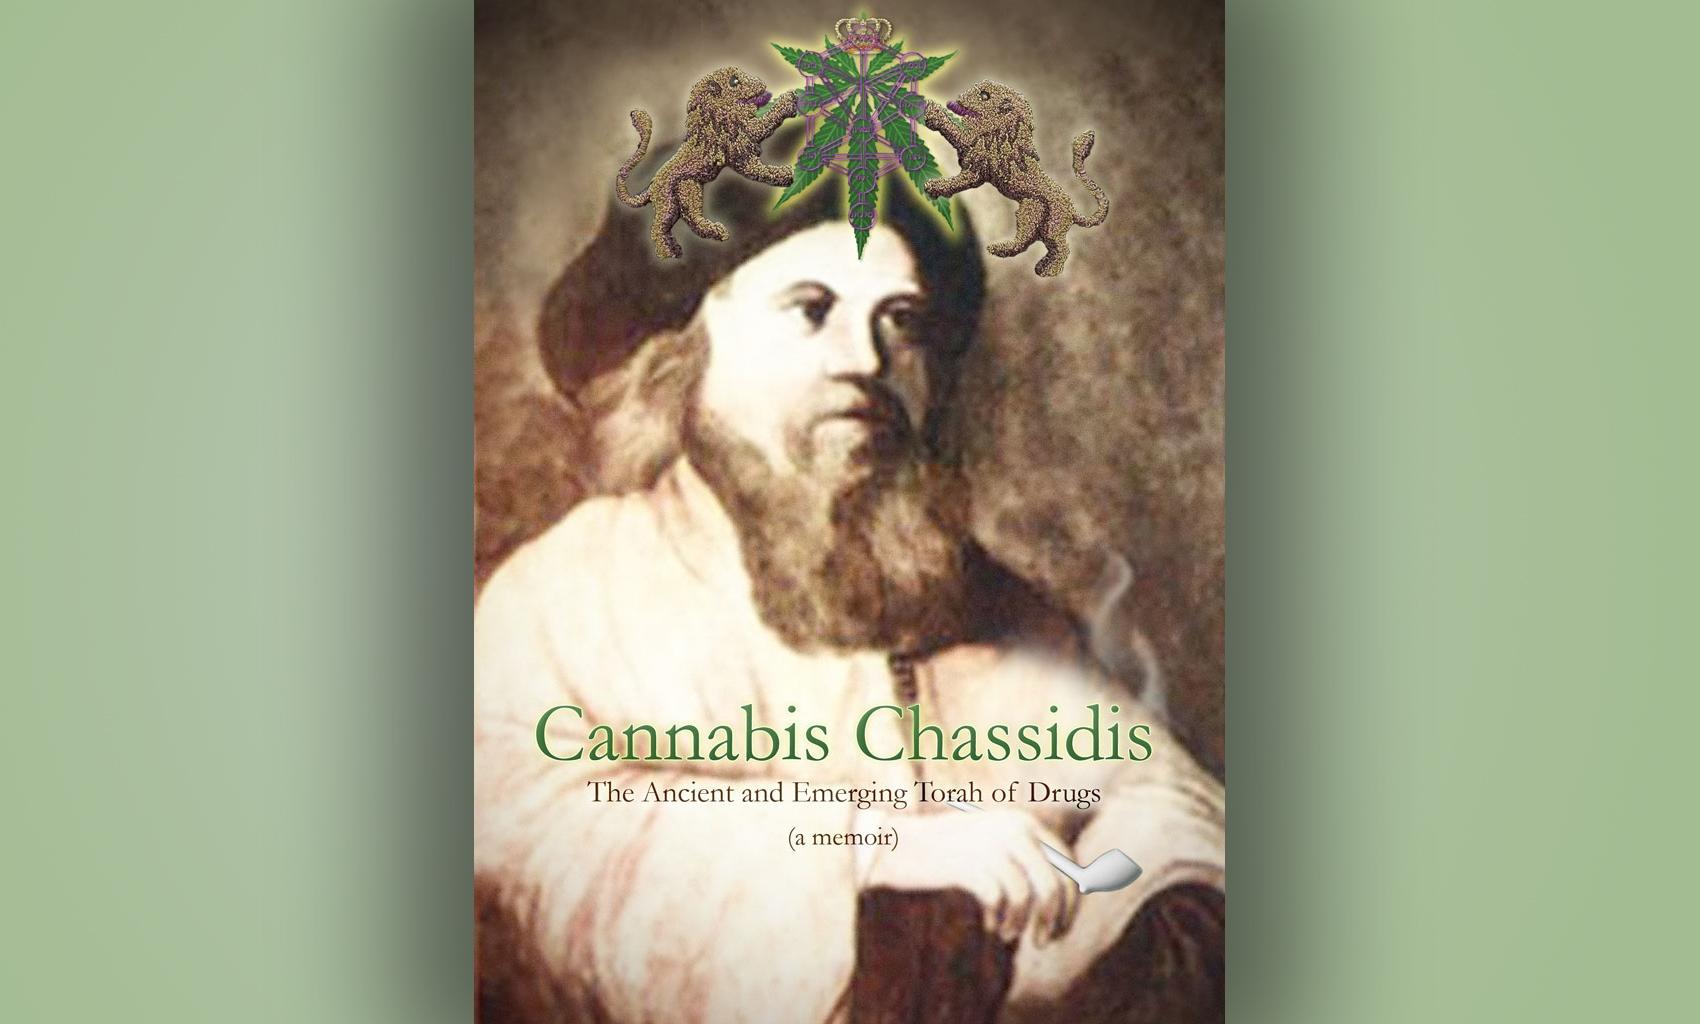 Cannabis_Chassidis.jpg